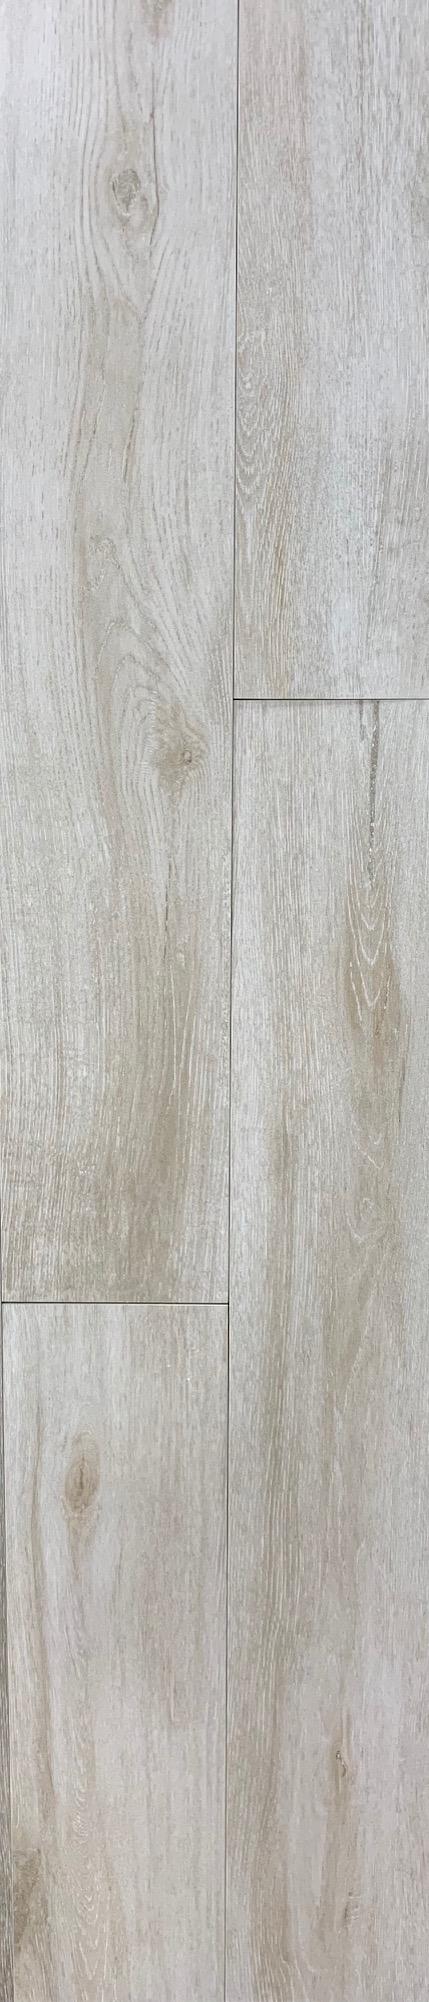 Wood Grain Porcelain Tile Argenta Nieve Tiles Amp Stone